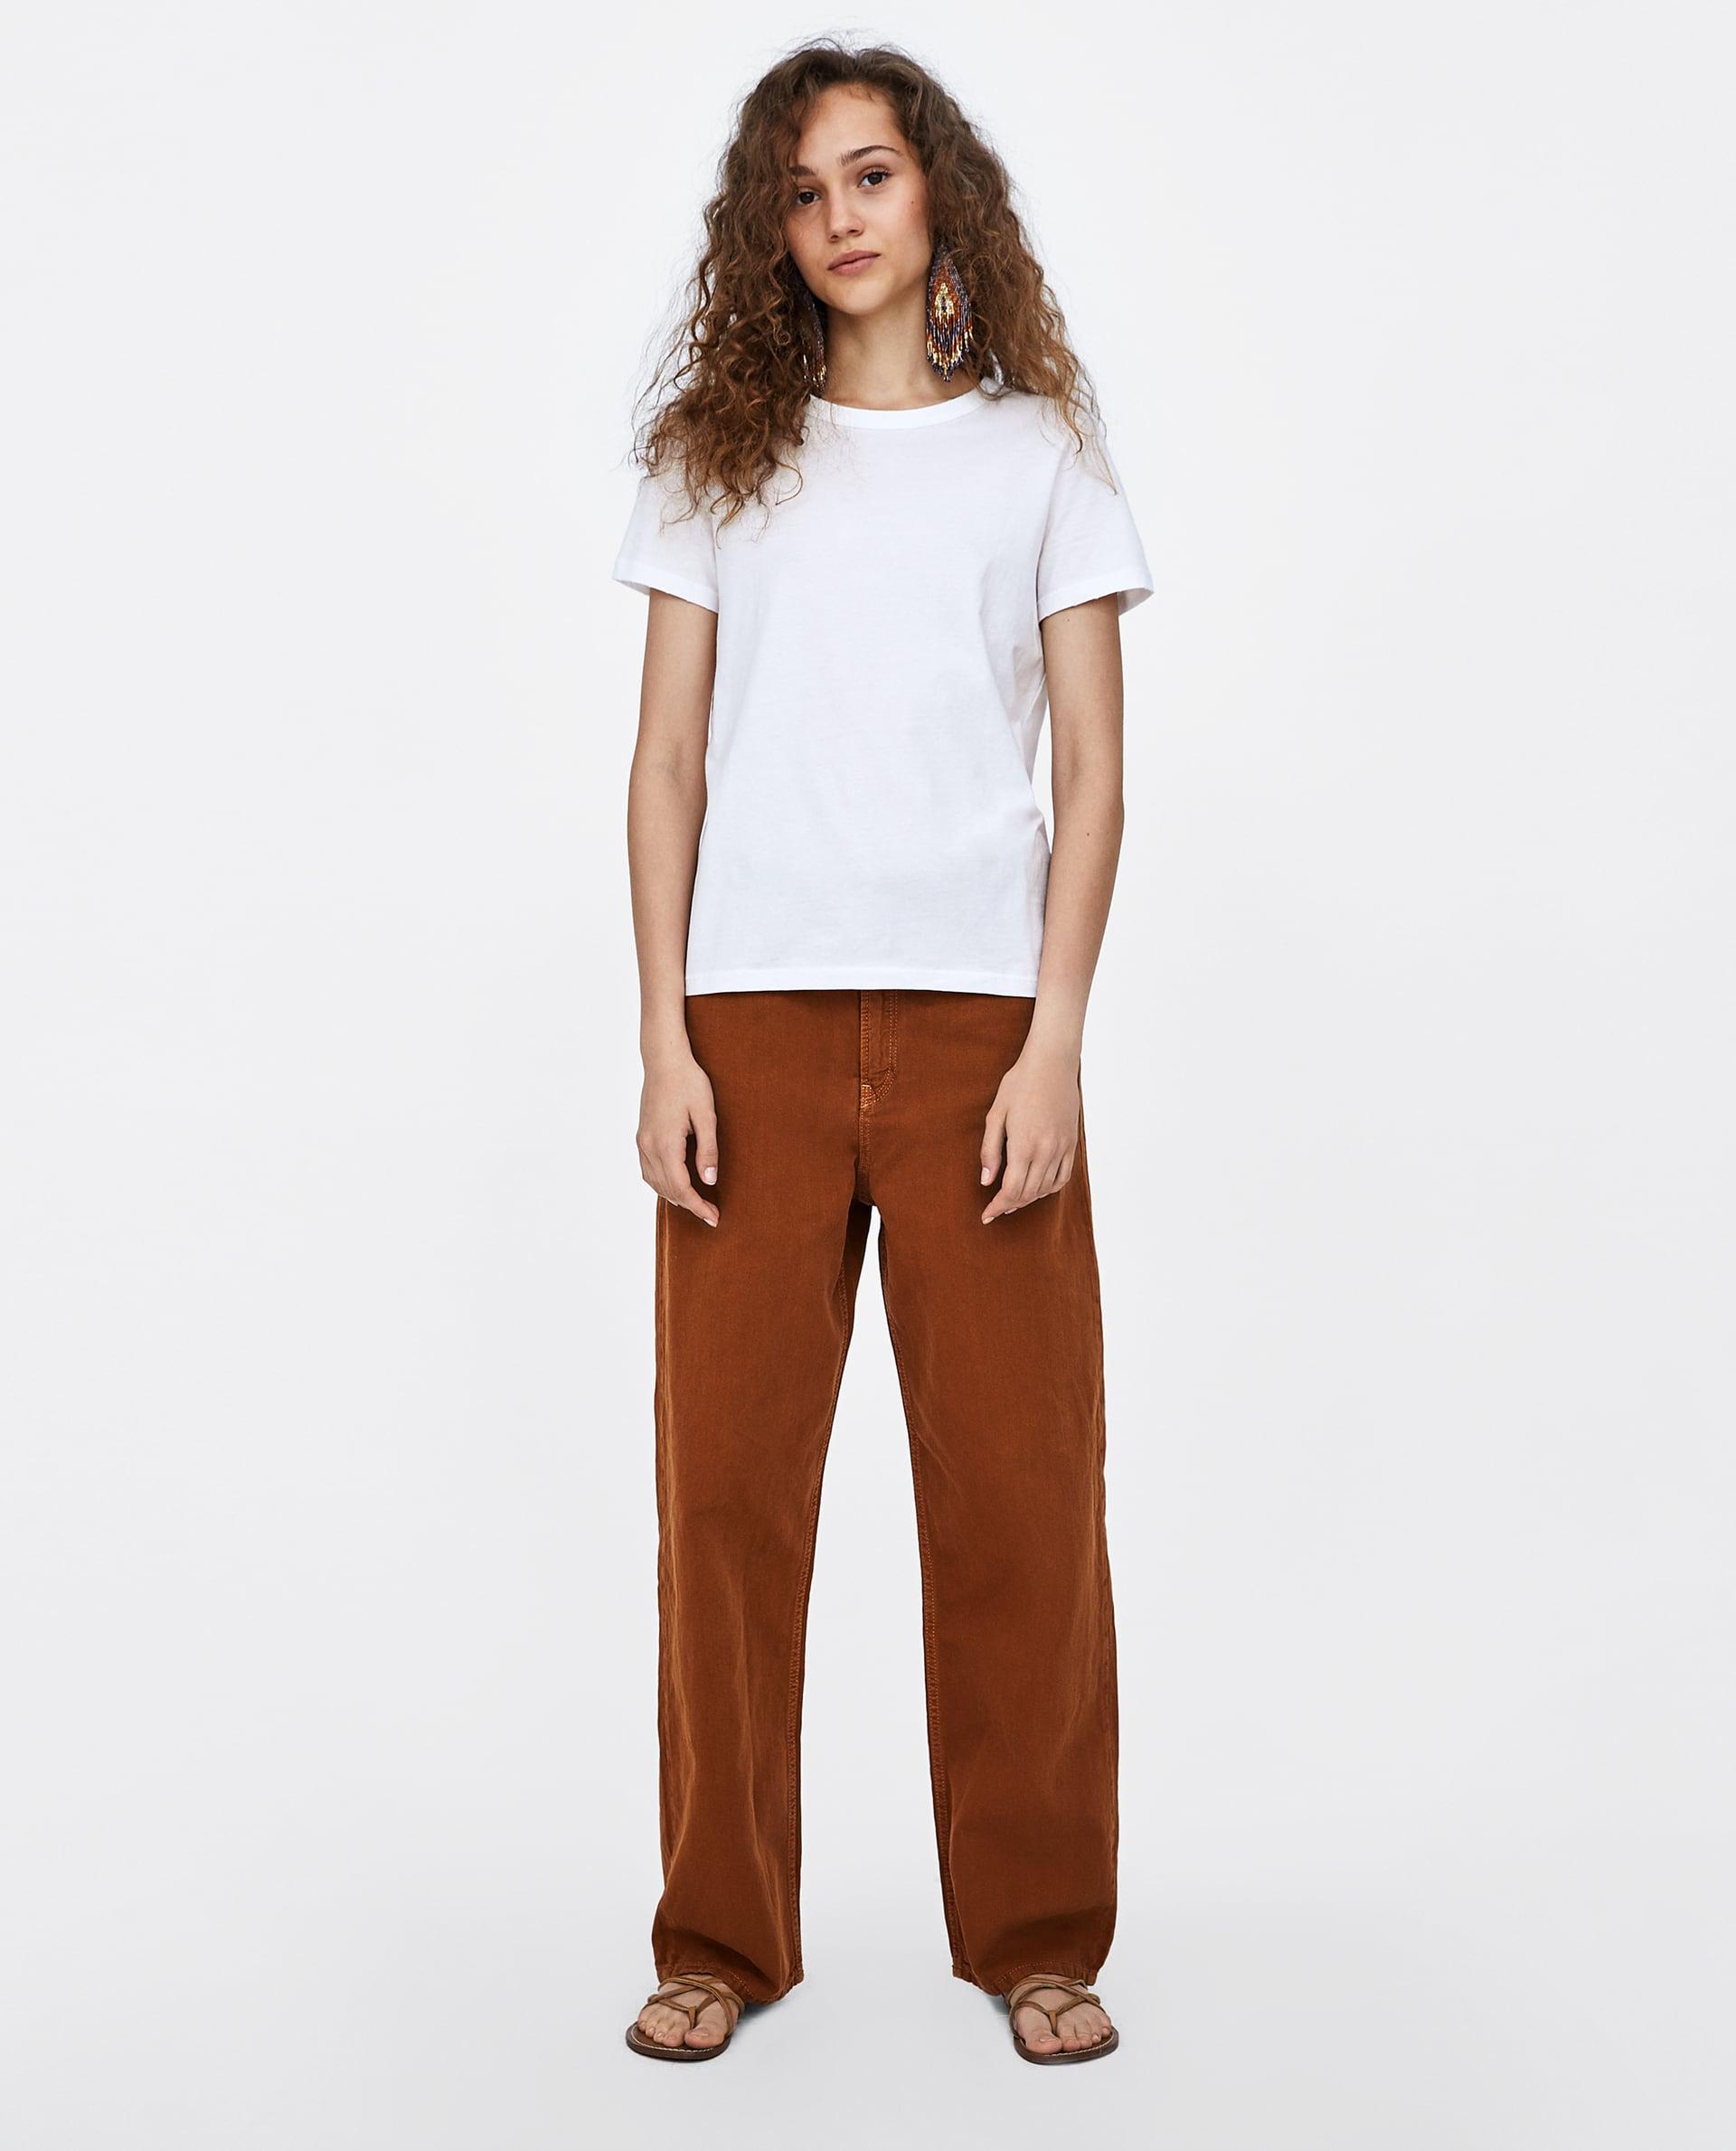 faded-basic-t--shirtshort-sleeve-t-shirts-woman by zara